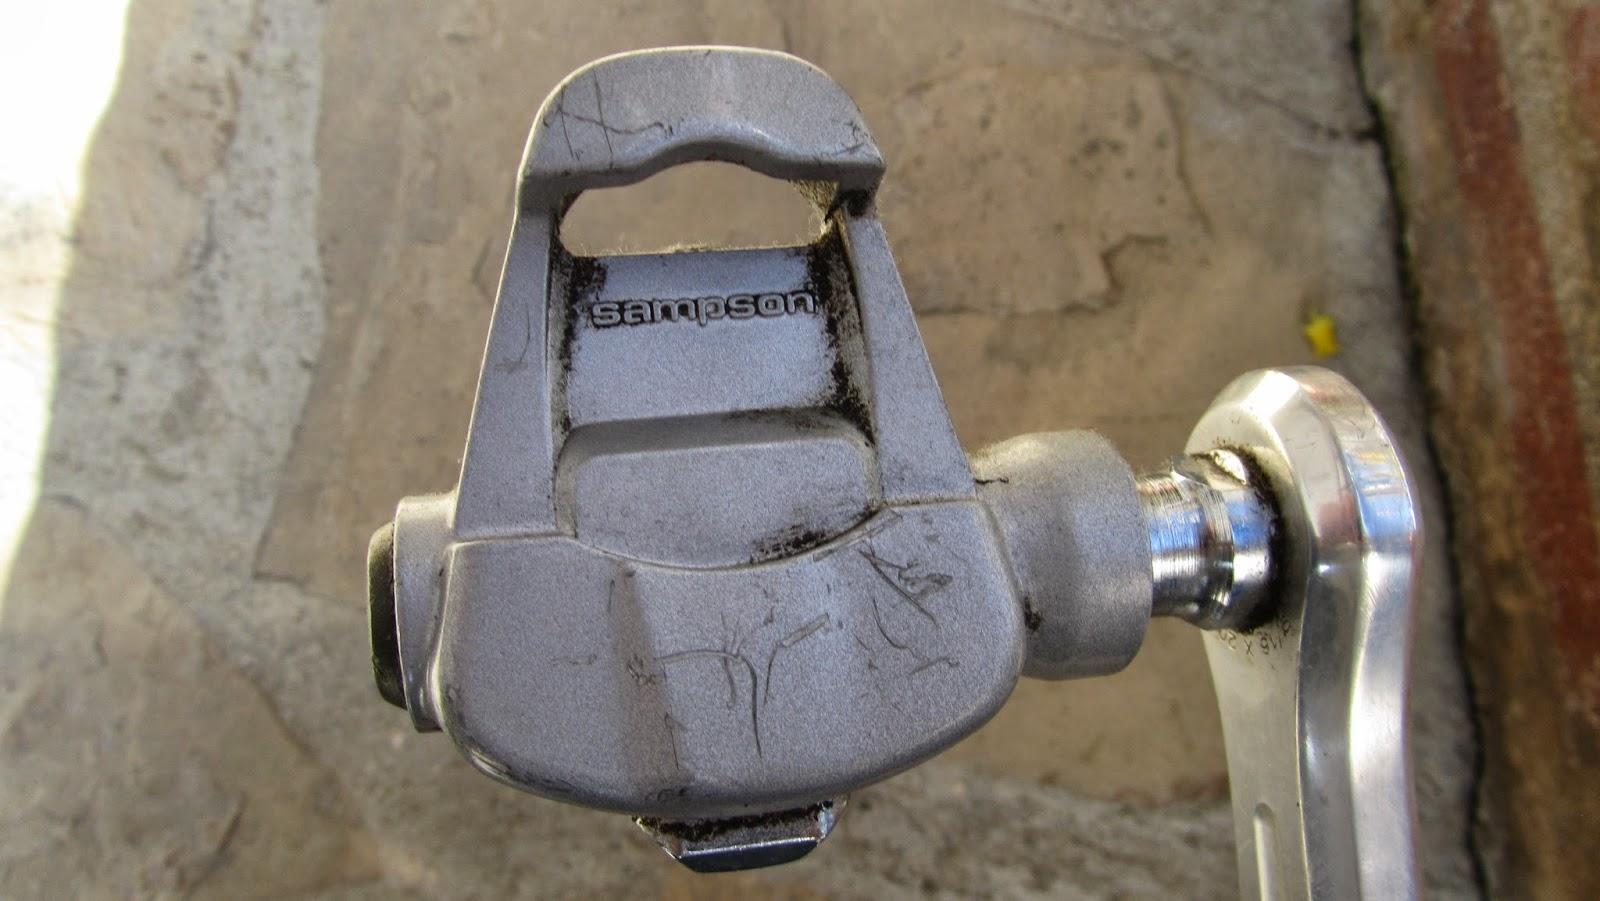 bicicleta orbea contrarreloj - pedal sampson